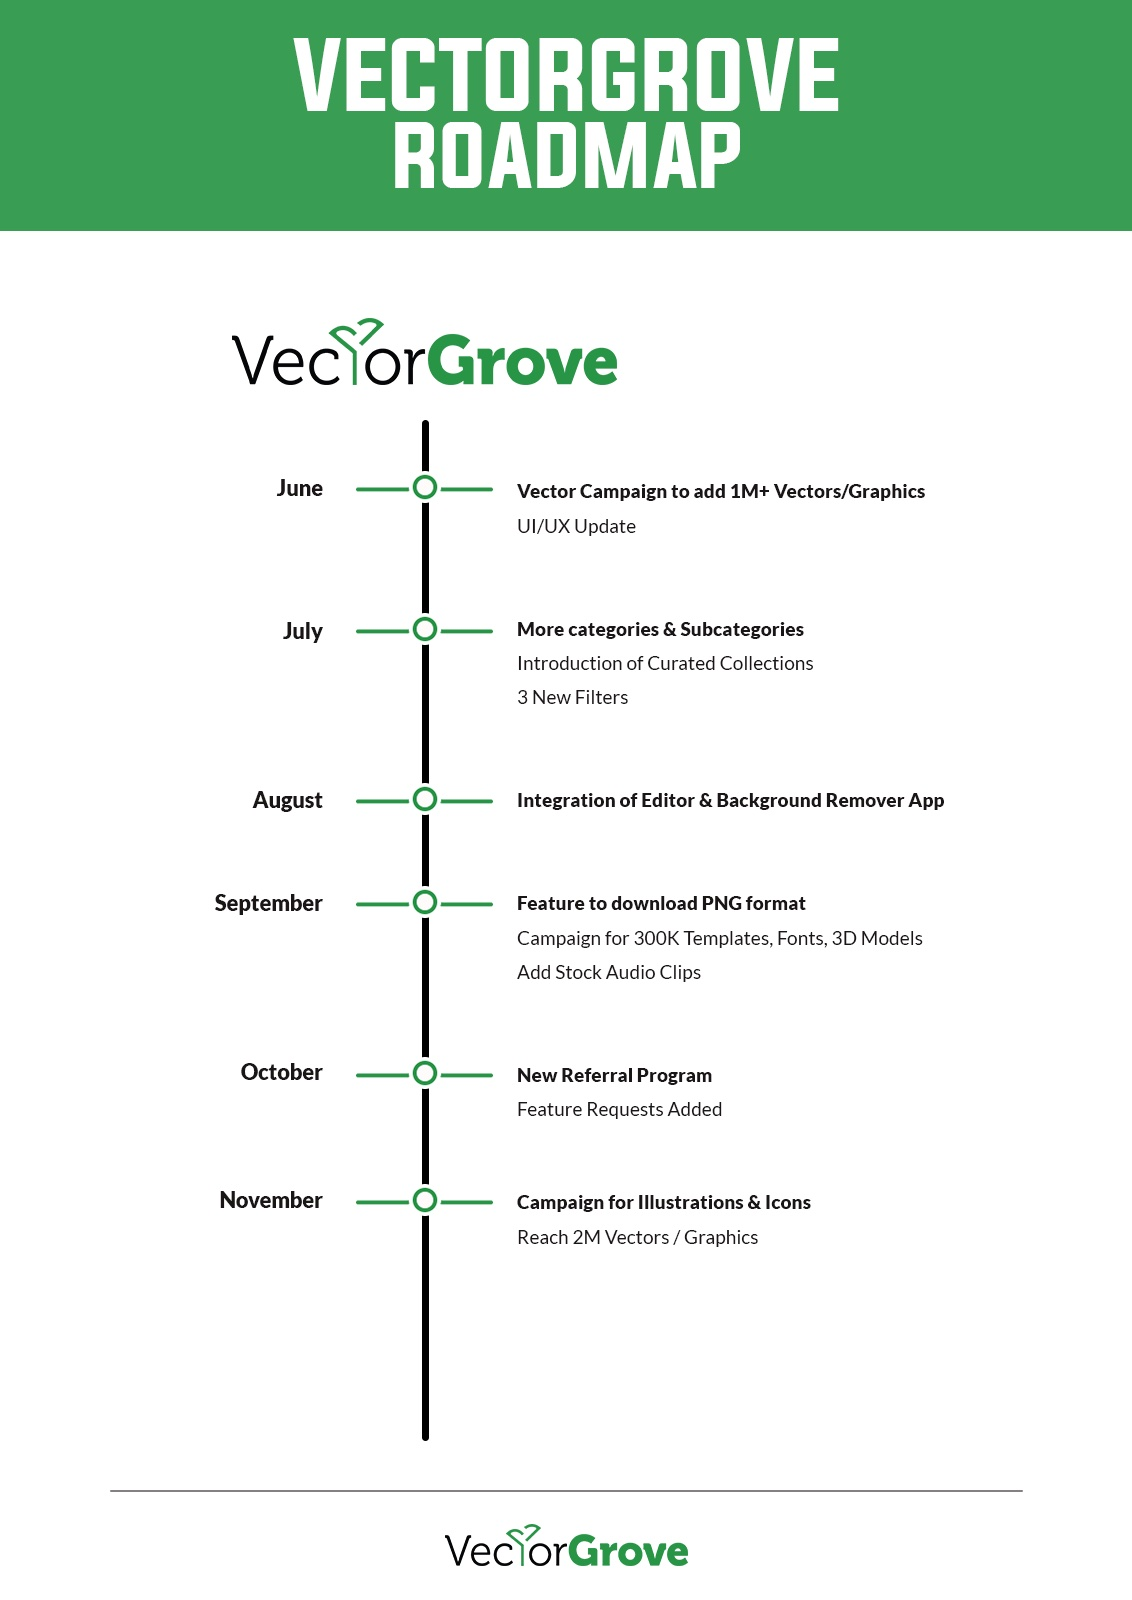 Vectorgrove Roadmap